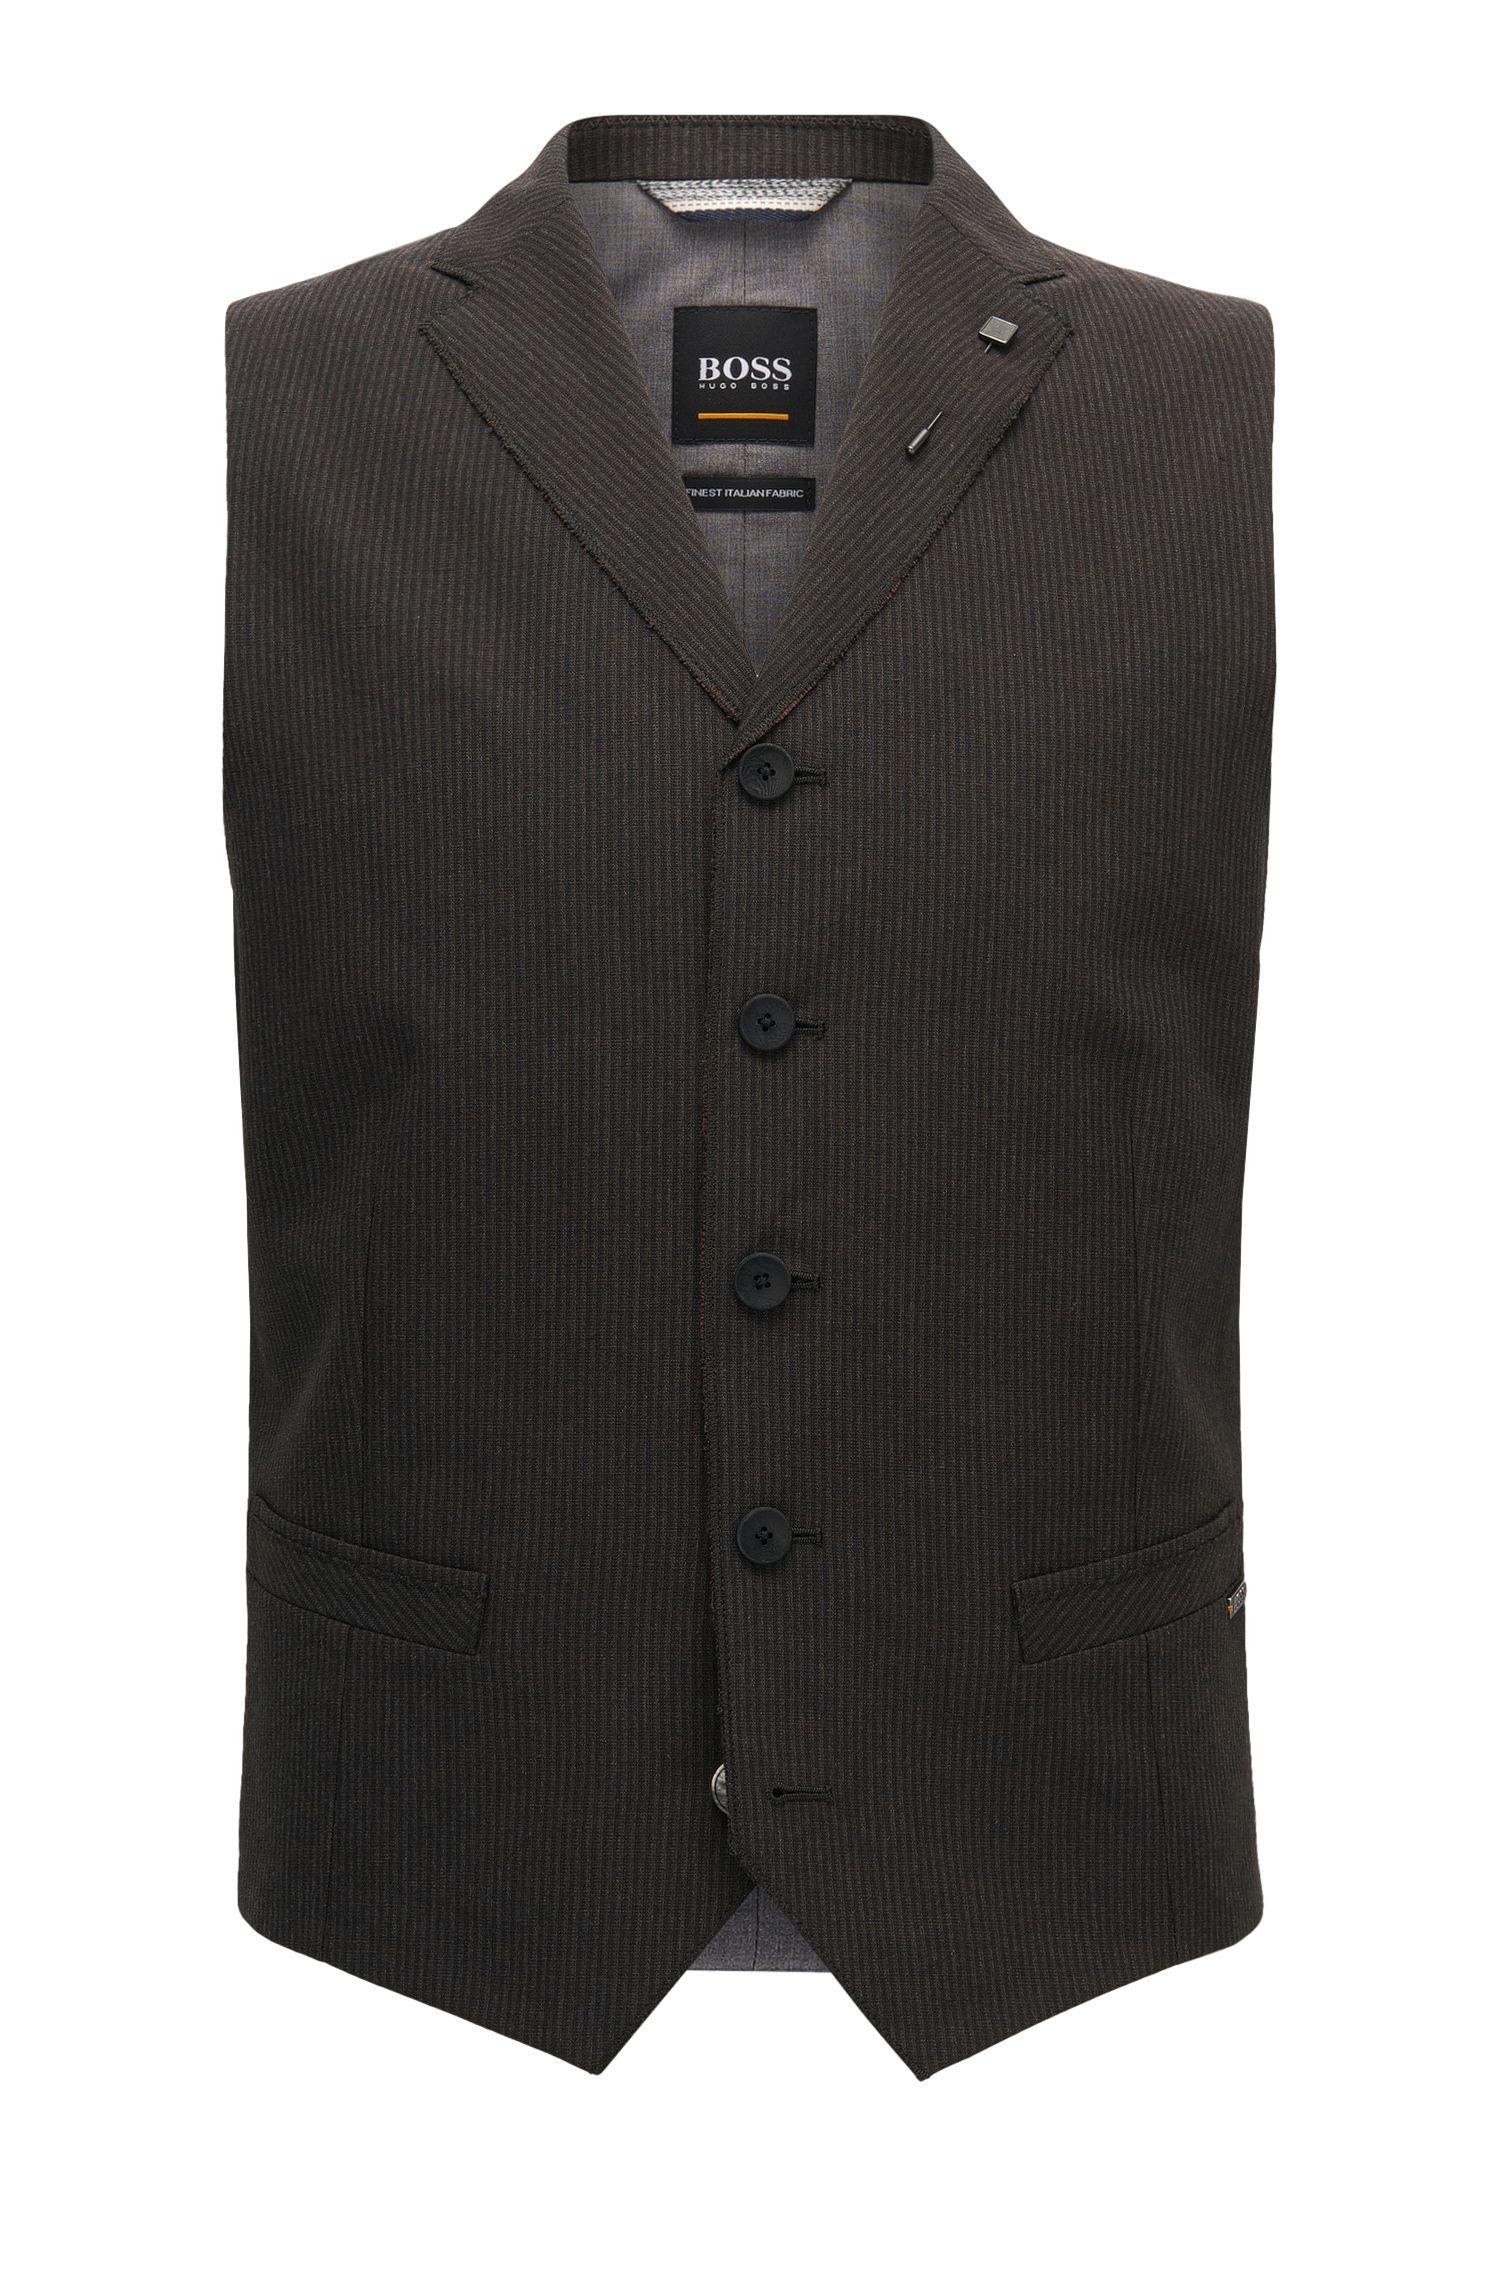 Pinstriped Italian Fabric Waistcoat | Bace BS